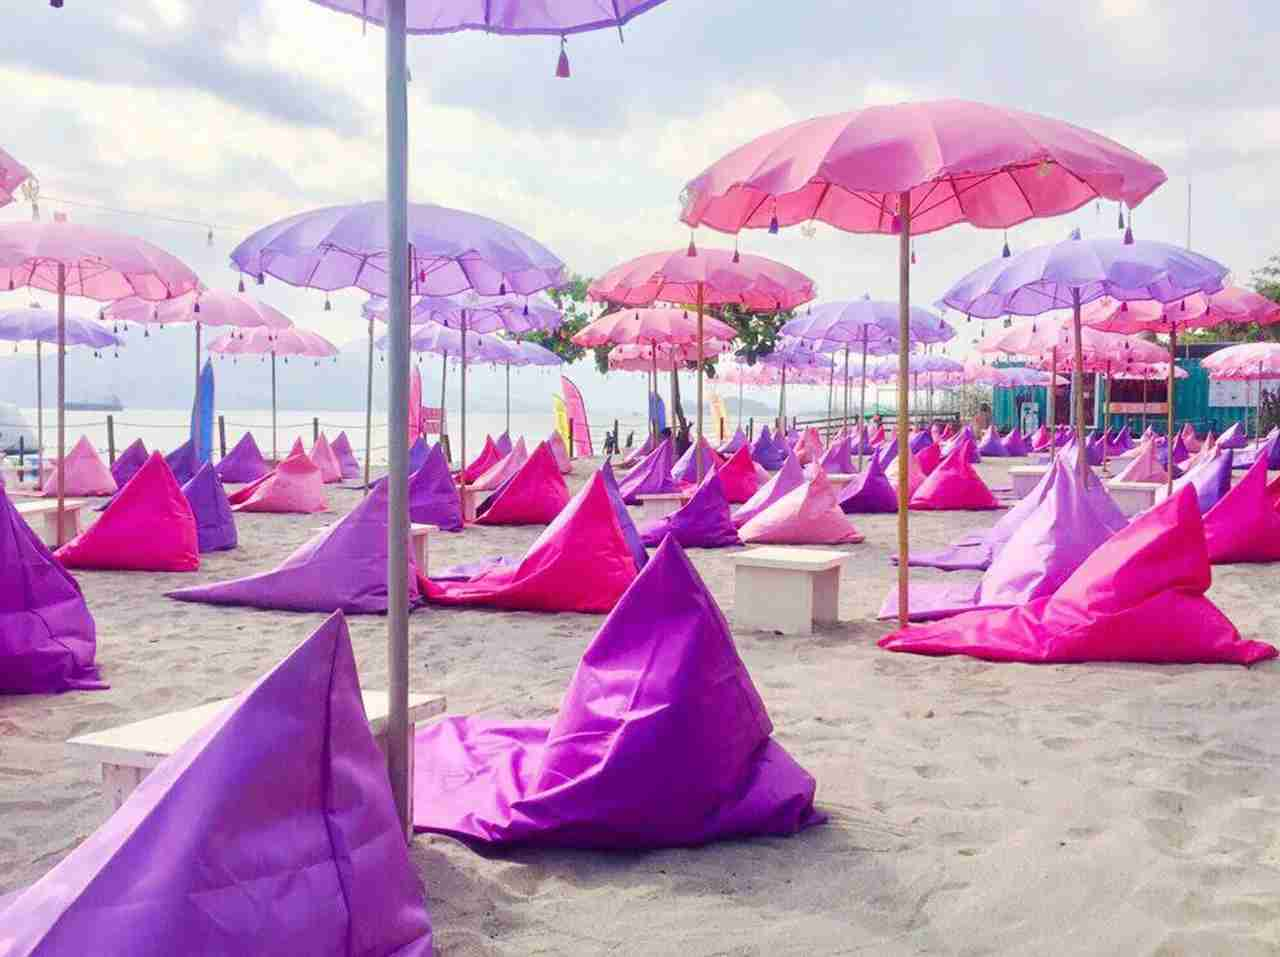 Bali Beach lounge. (Photo courtesy of The Inflatable Island)